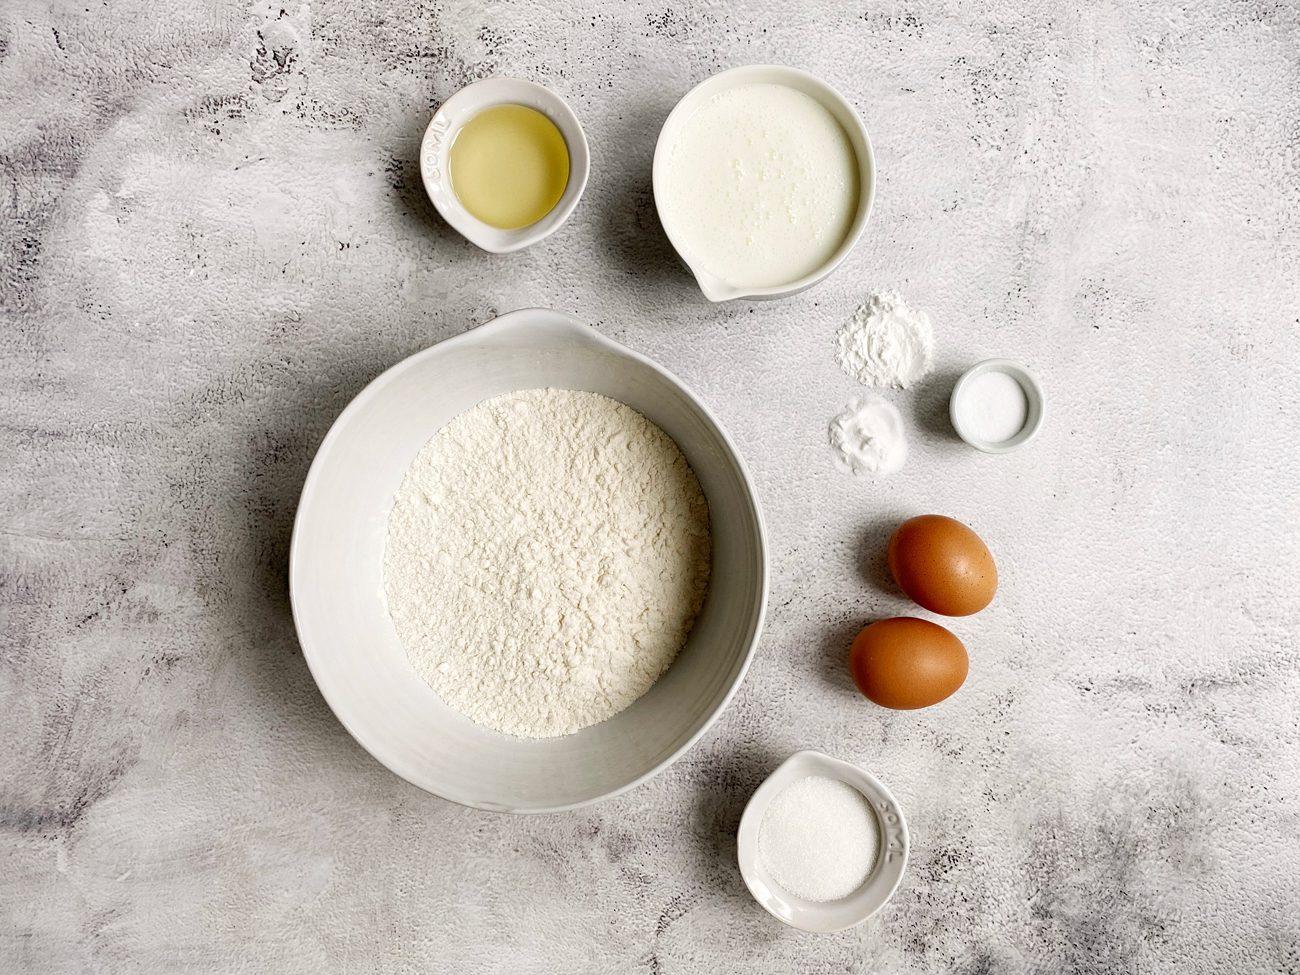 Alle ingrediënten voor american pancakes.